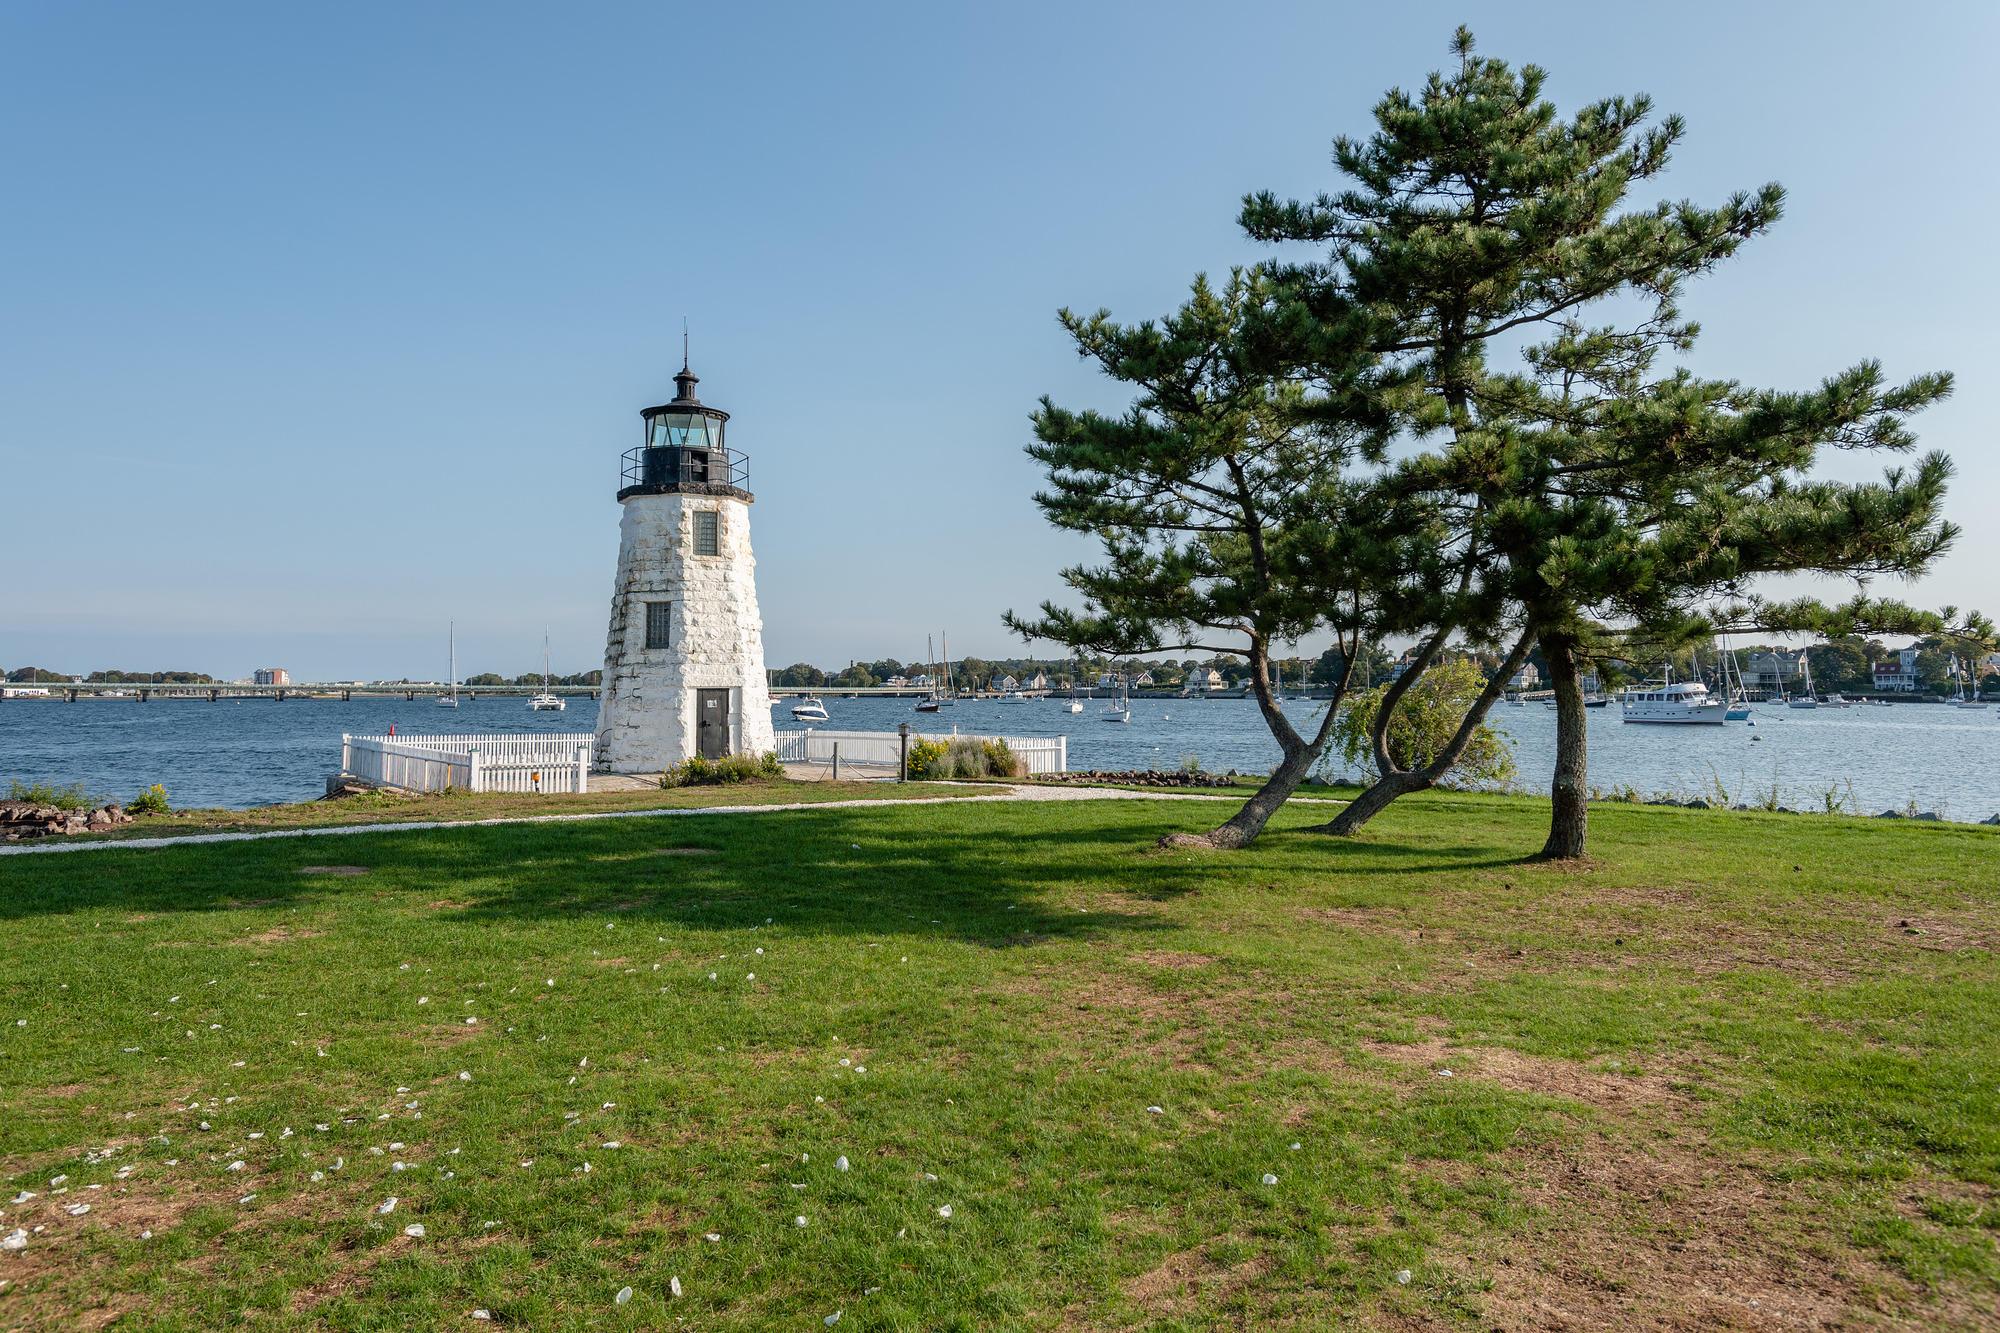 The coast and harbor of Newport, Rhode Island